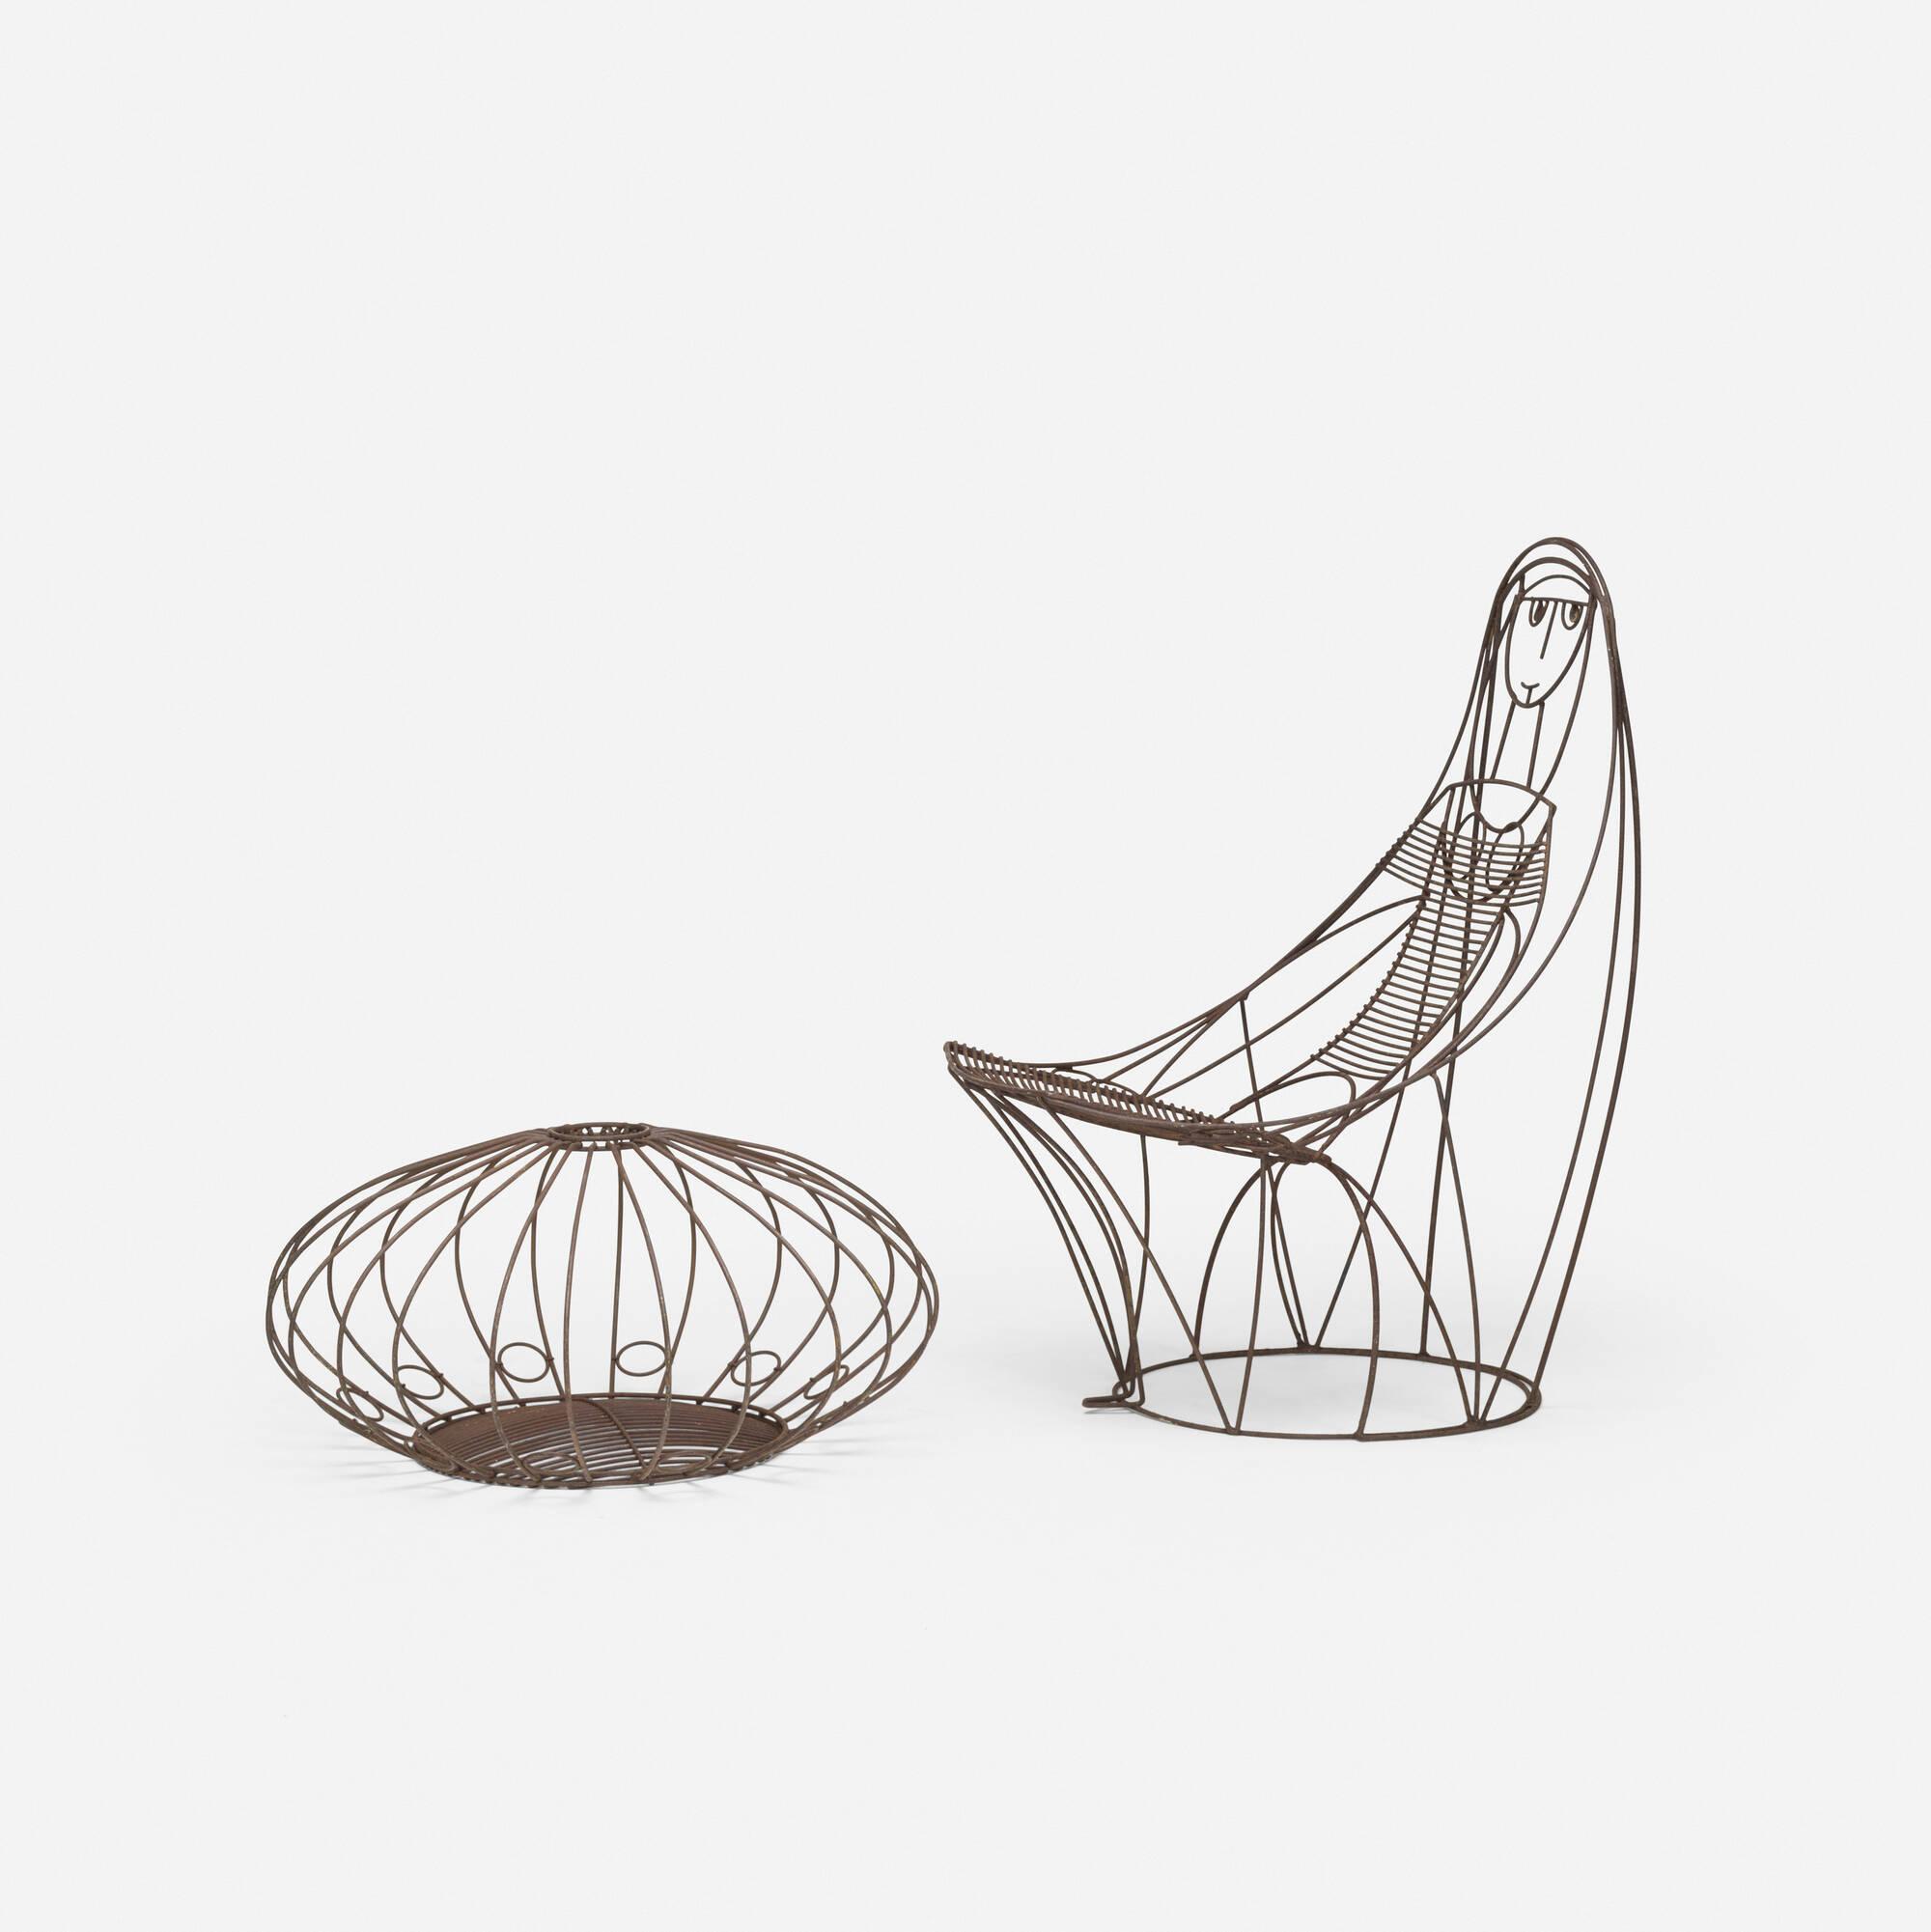 680: John Risley / lounge chair and ottoman (2 of 3)